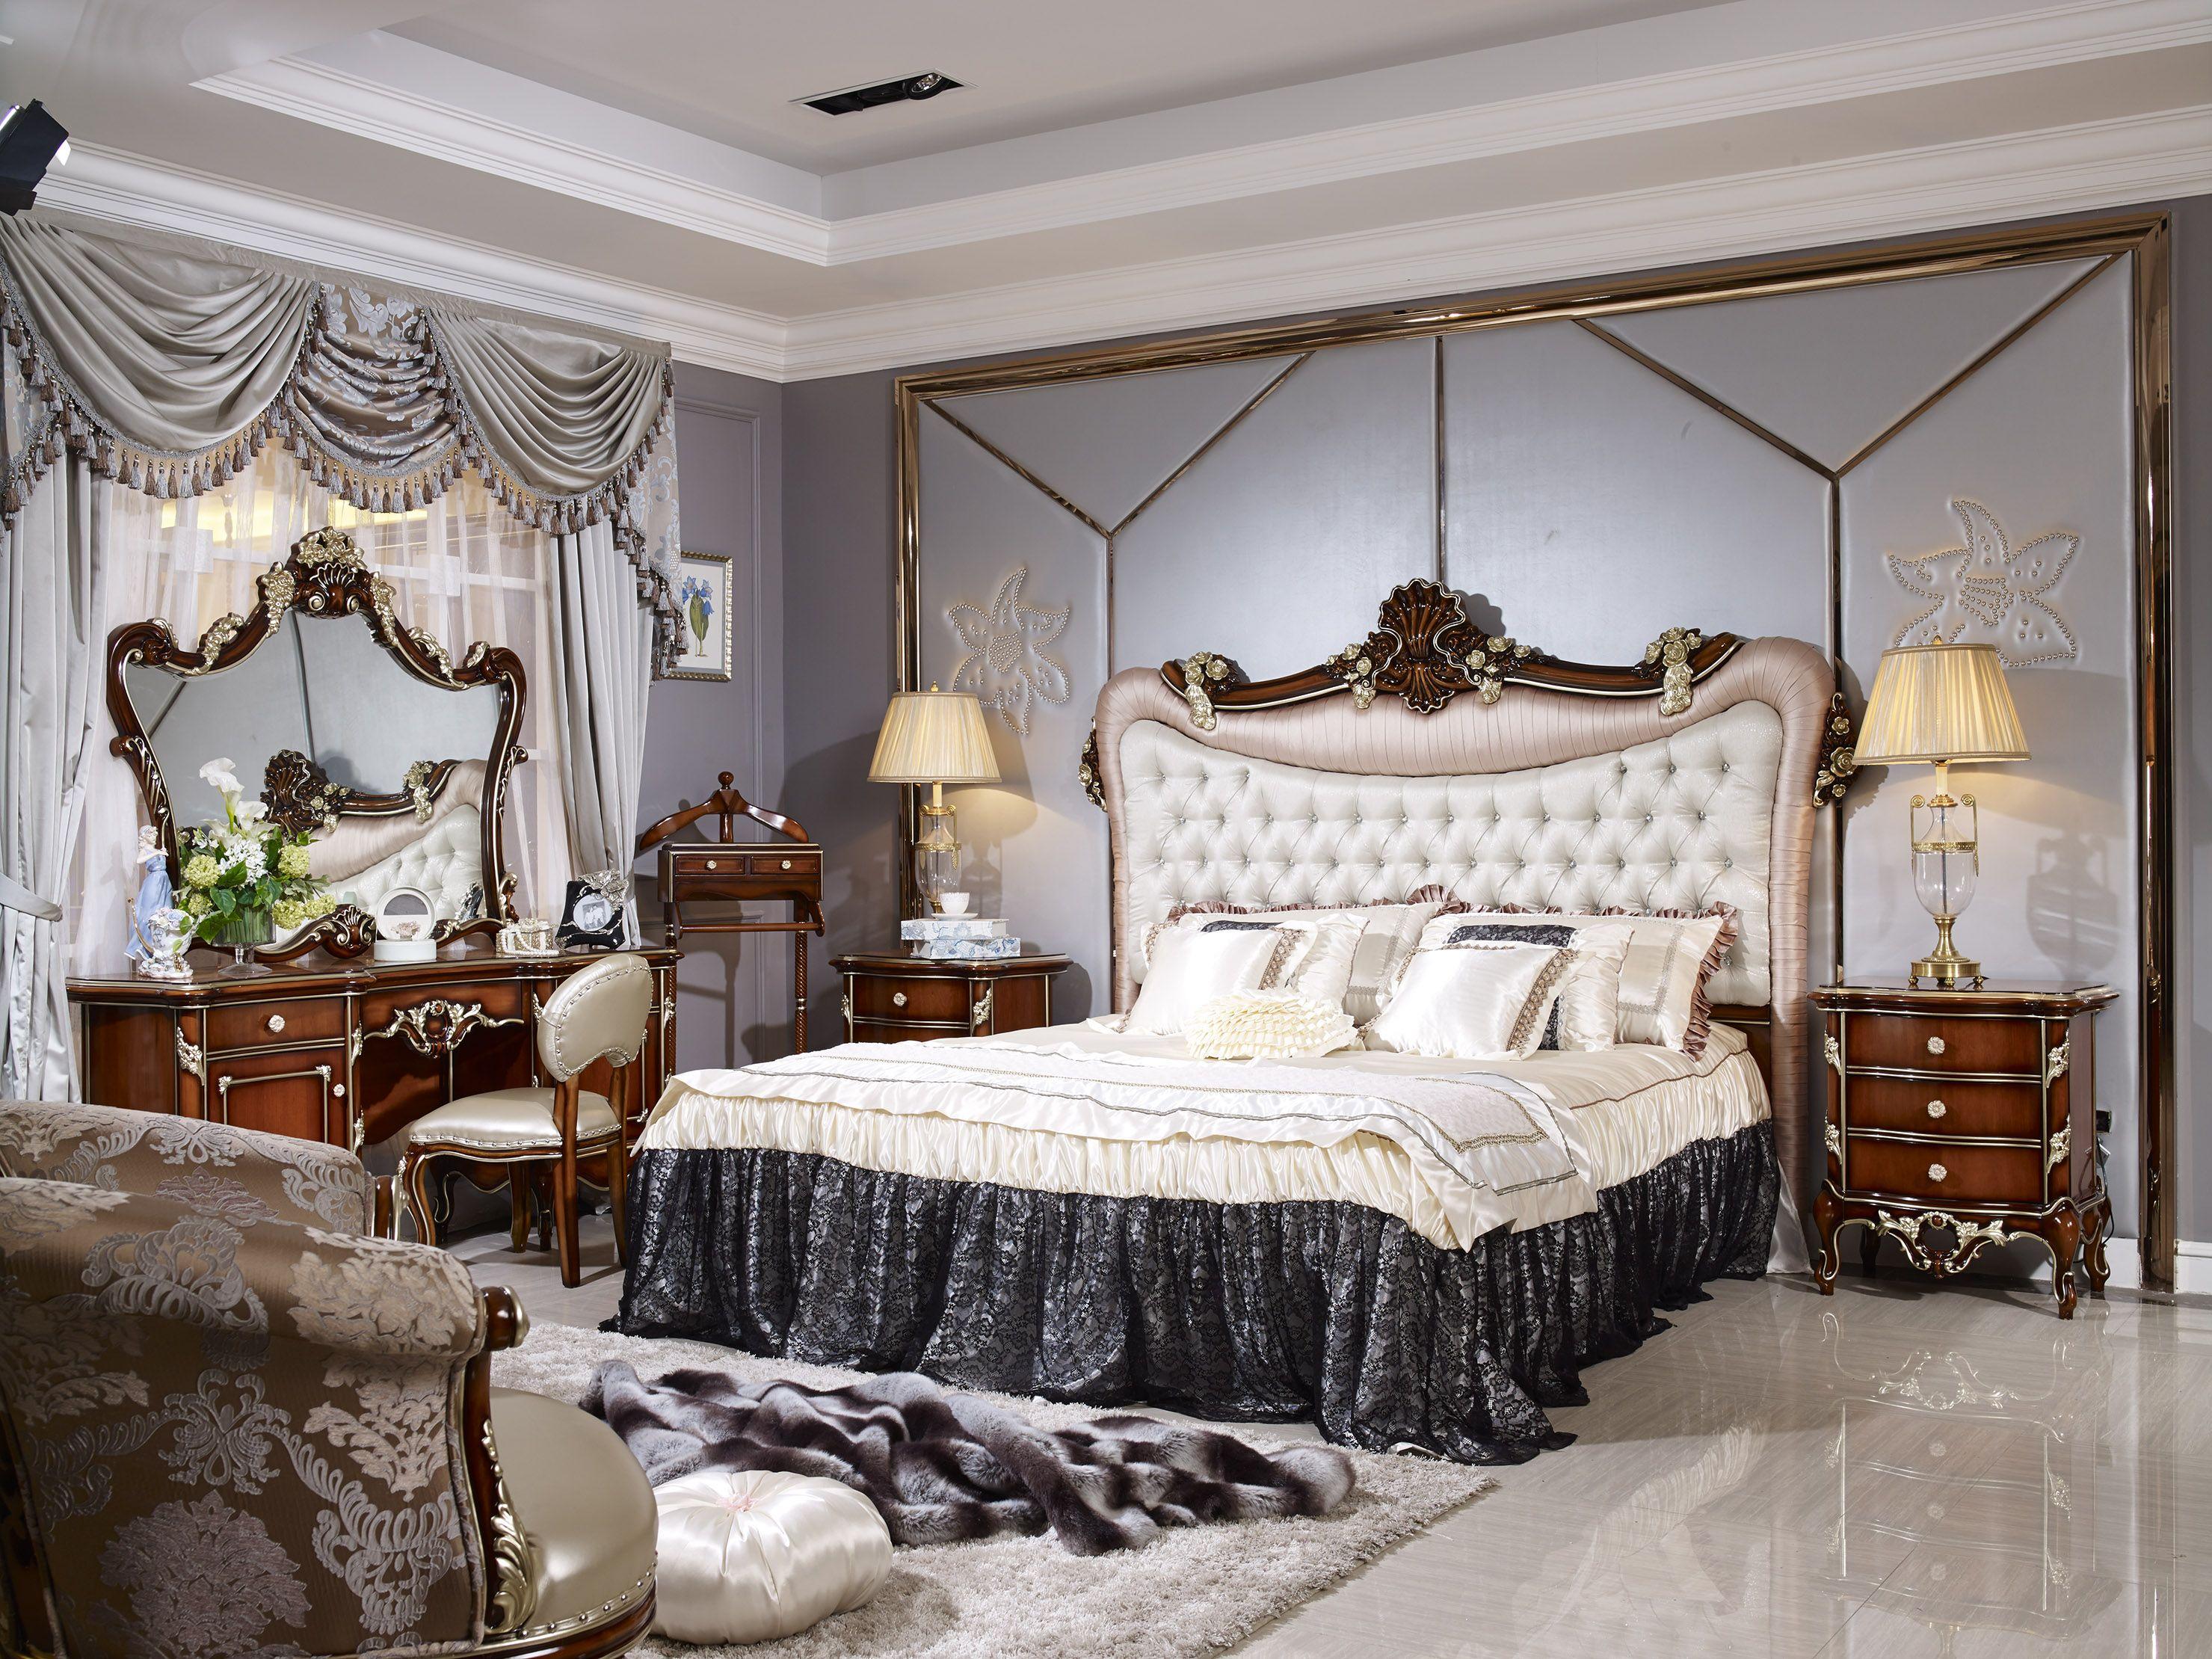 royal bedroom sets - HD2959×2219